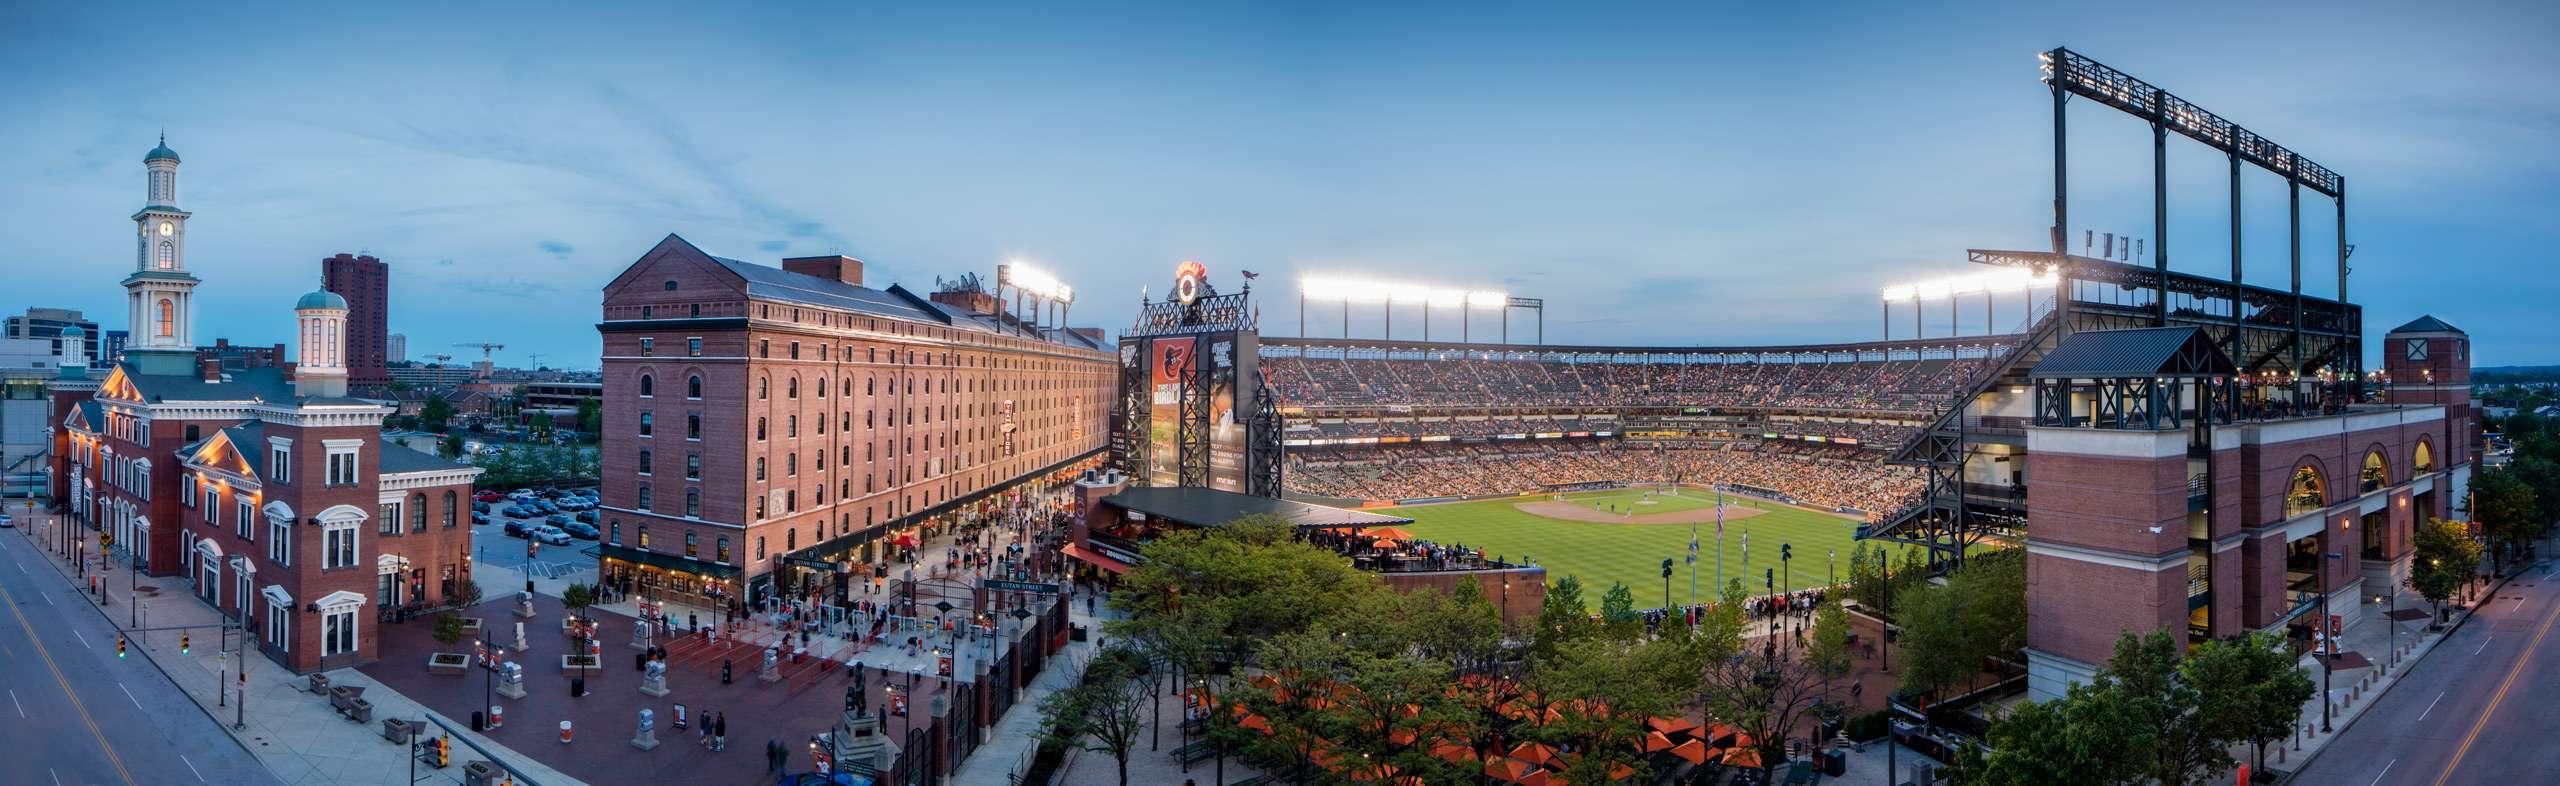 PORTFOLIO - Baltimore - Attractions #29